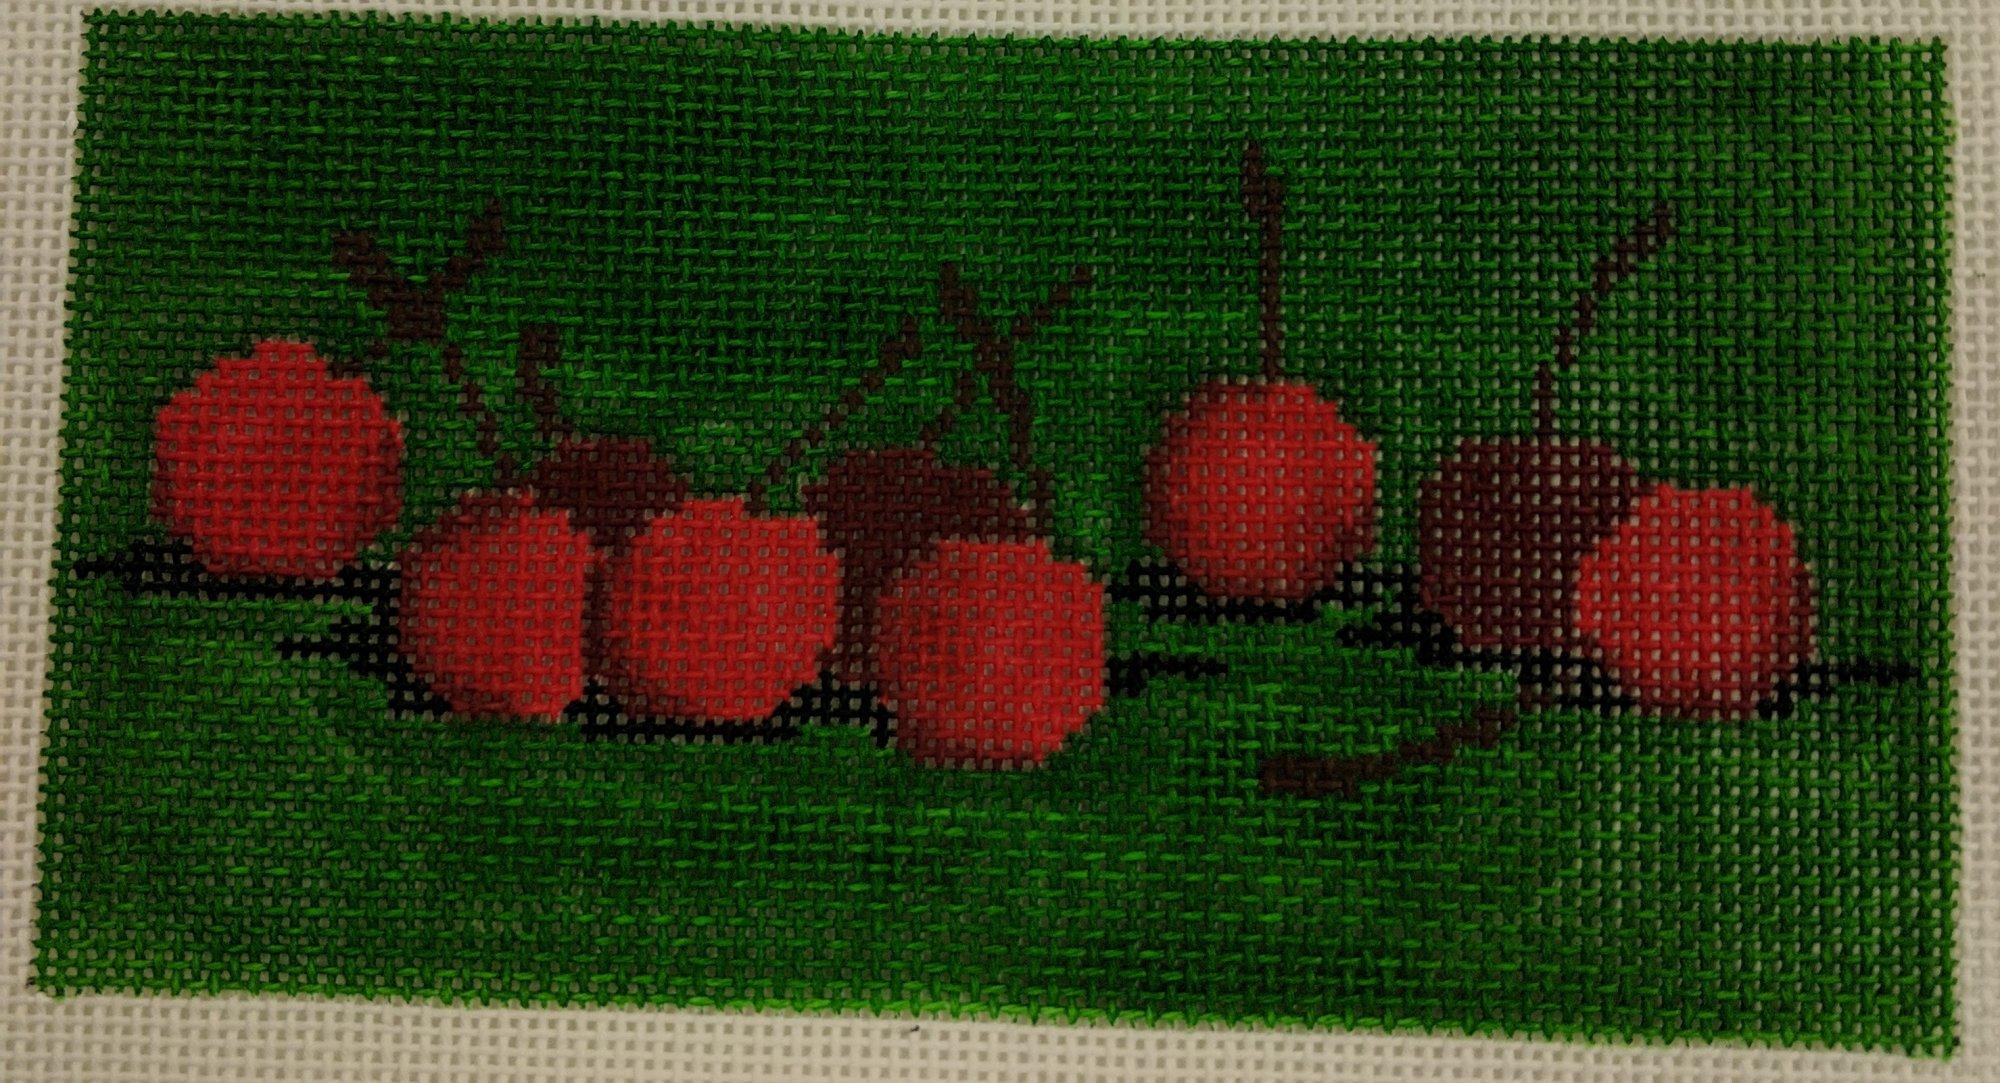 Cherries on Green, Fits Self Finishing CCW, 18 ct., 3 x 5.5